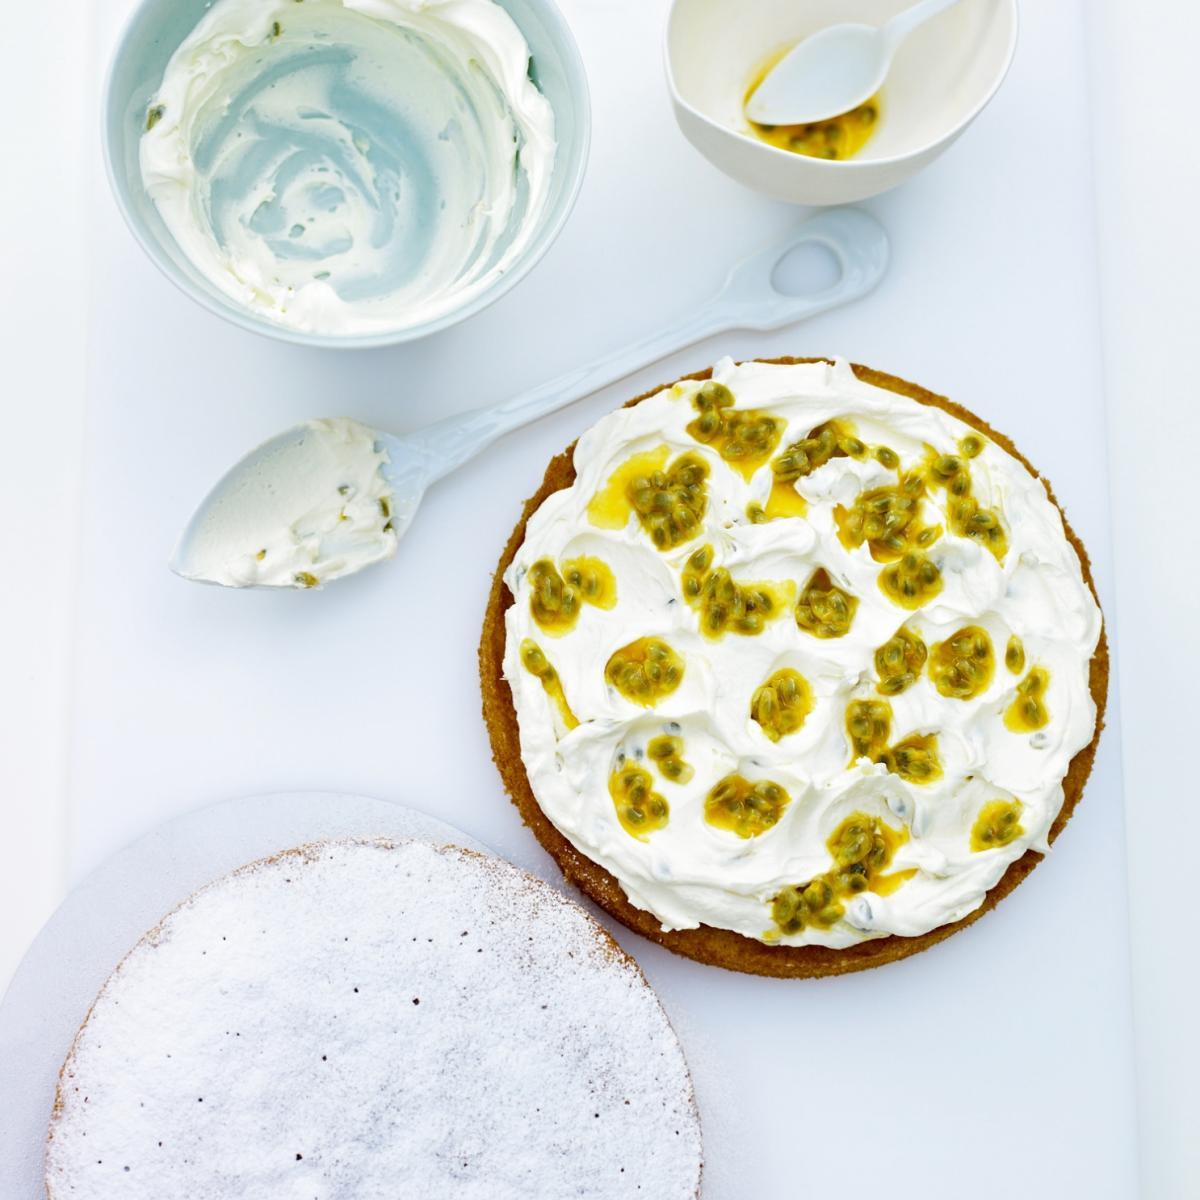 A picture of Delia's Fresh Orange and Passion Fruit Cake recipe